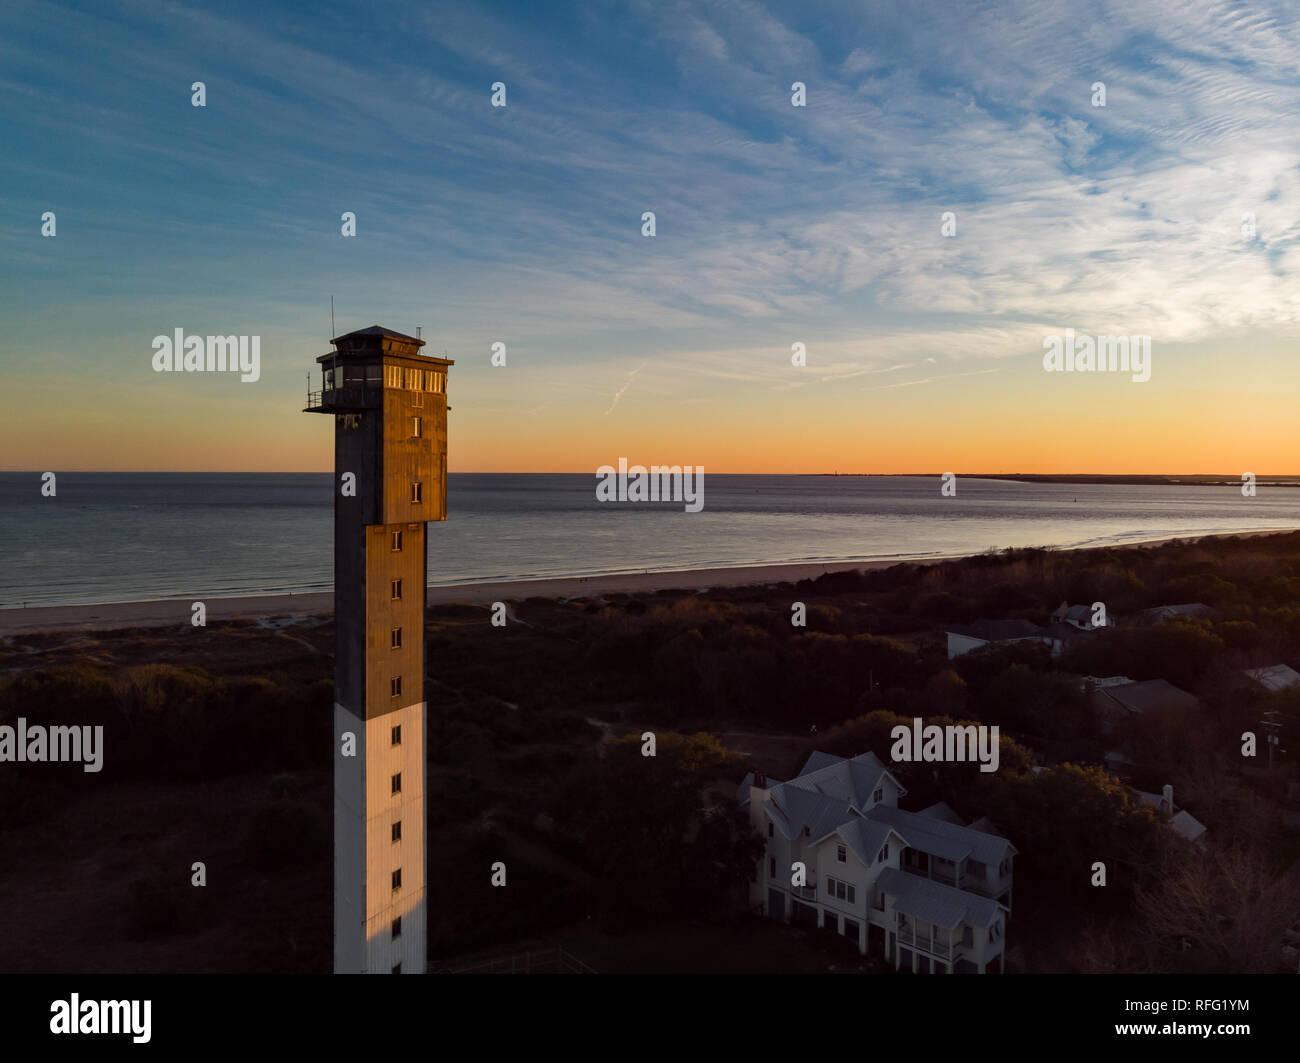 Lighthouse at Sunset - Stock Image